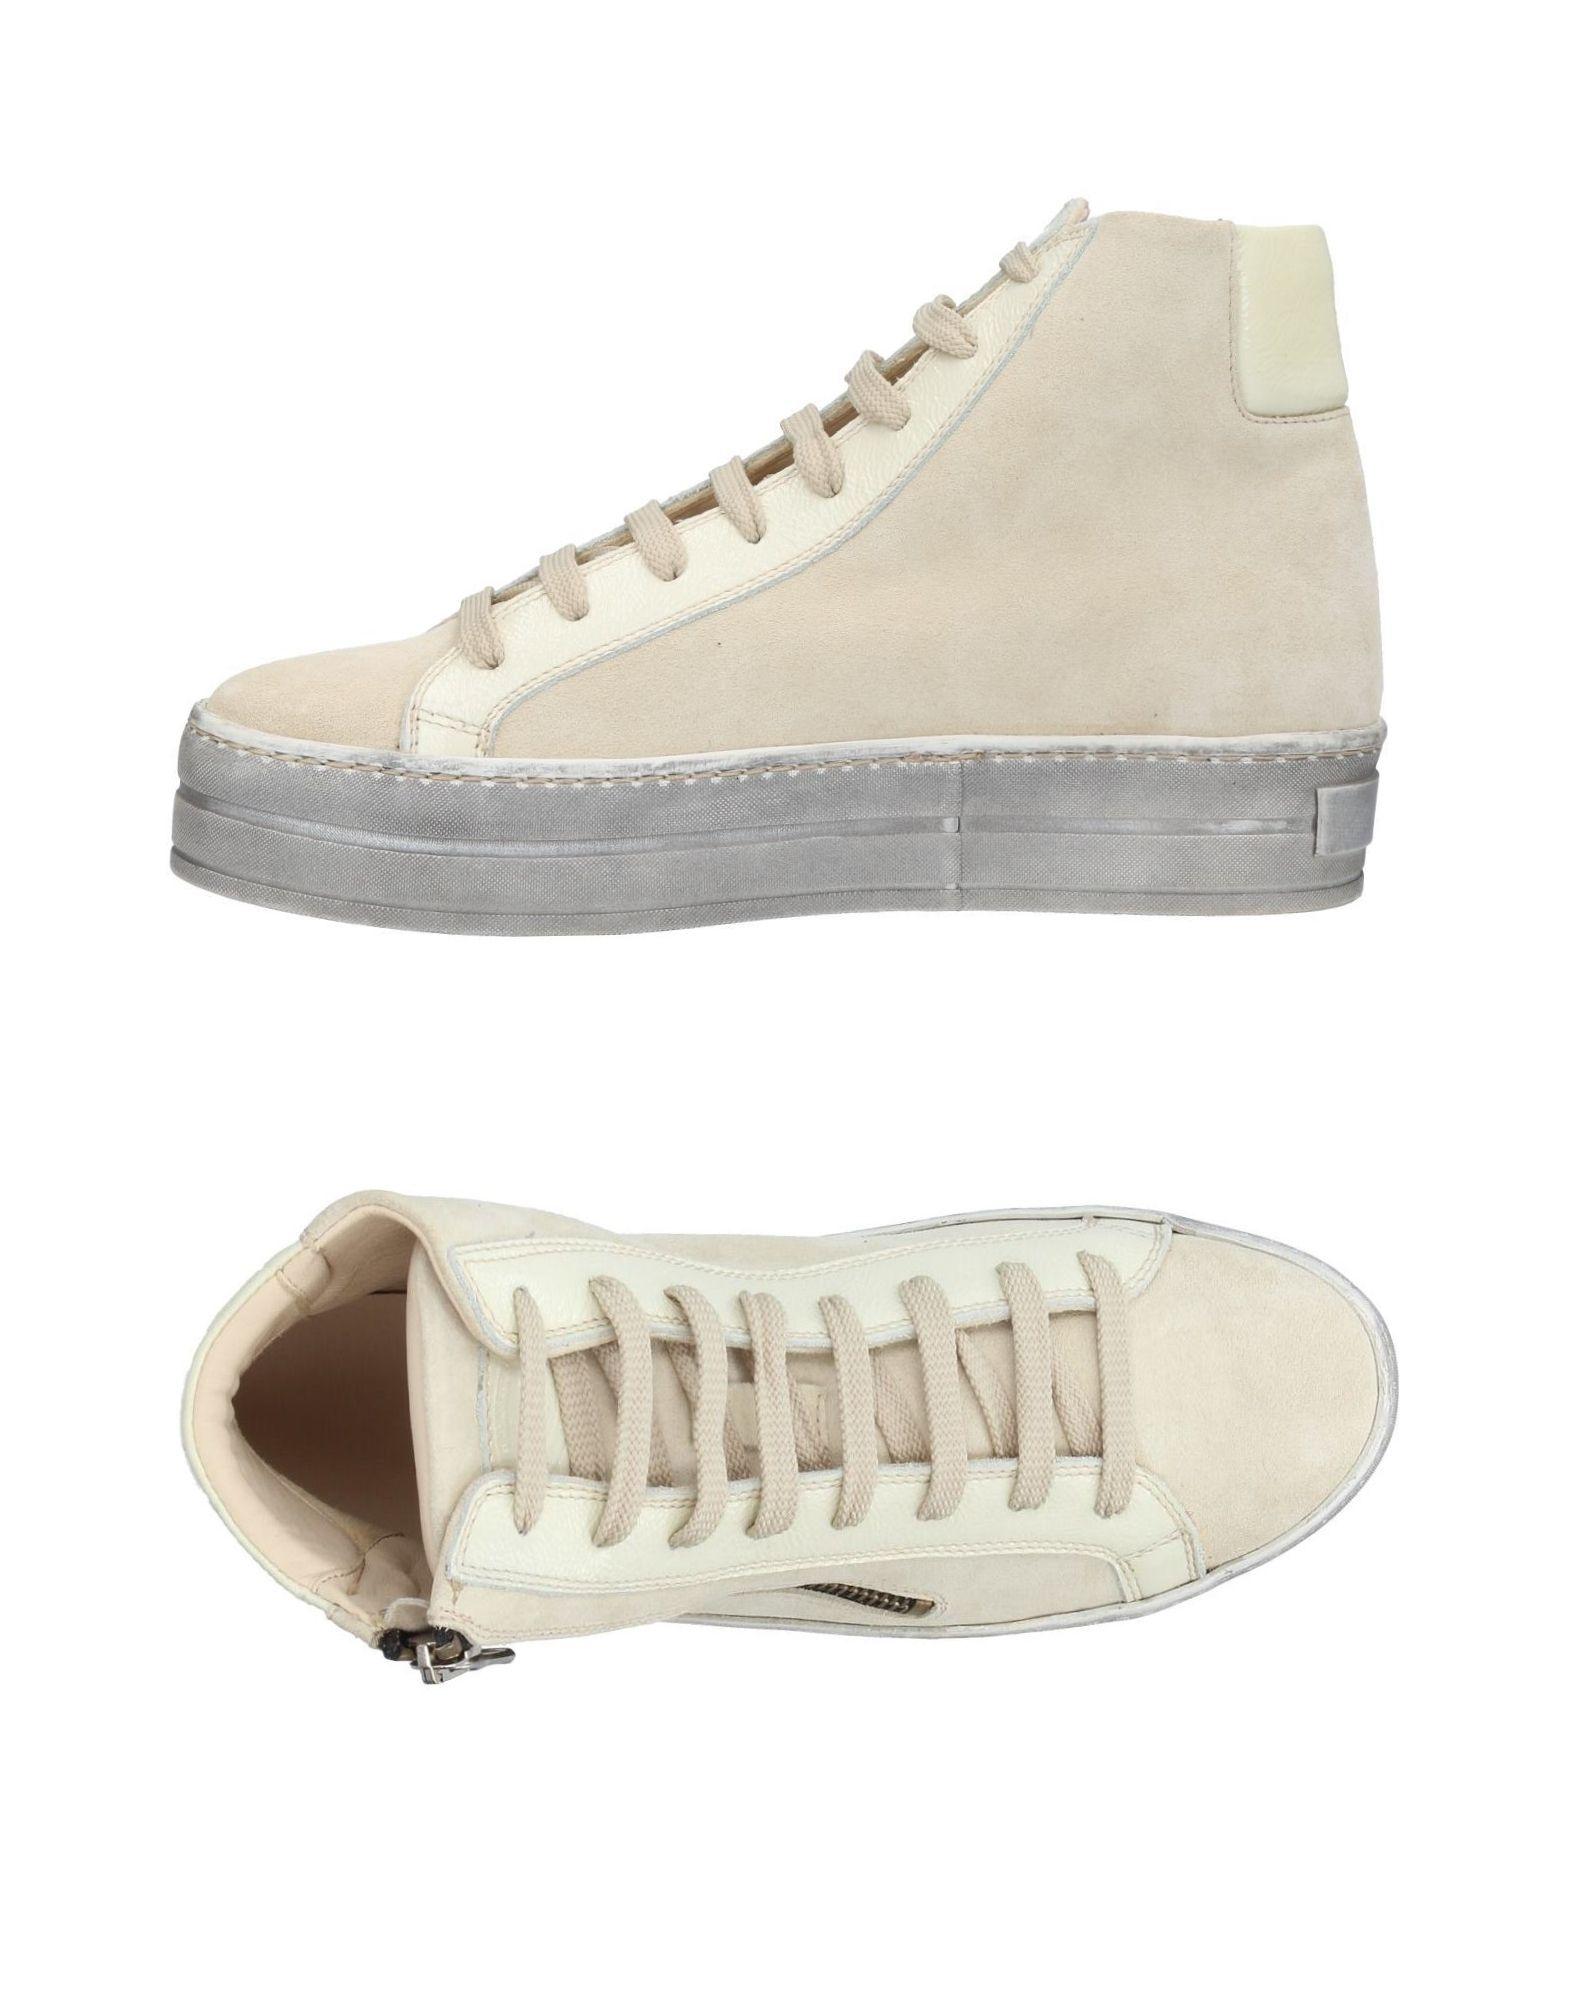 Moda Sneakers Joyks Donna - 11405480WK